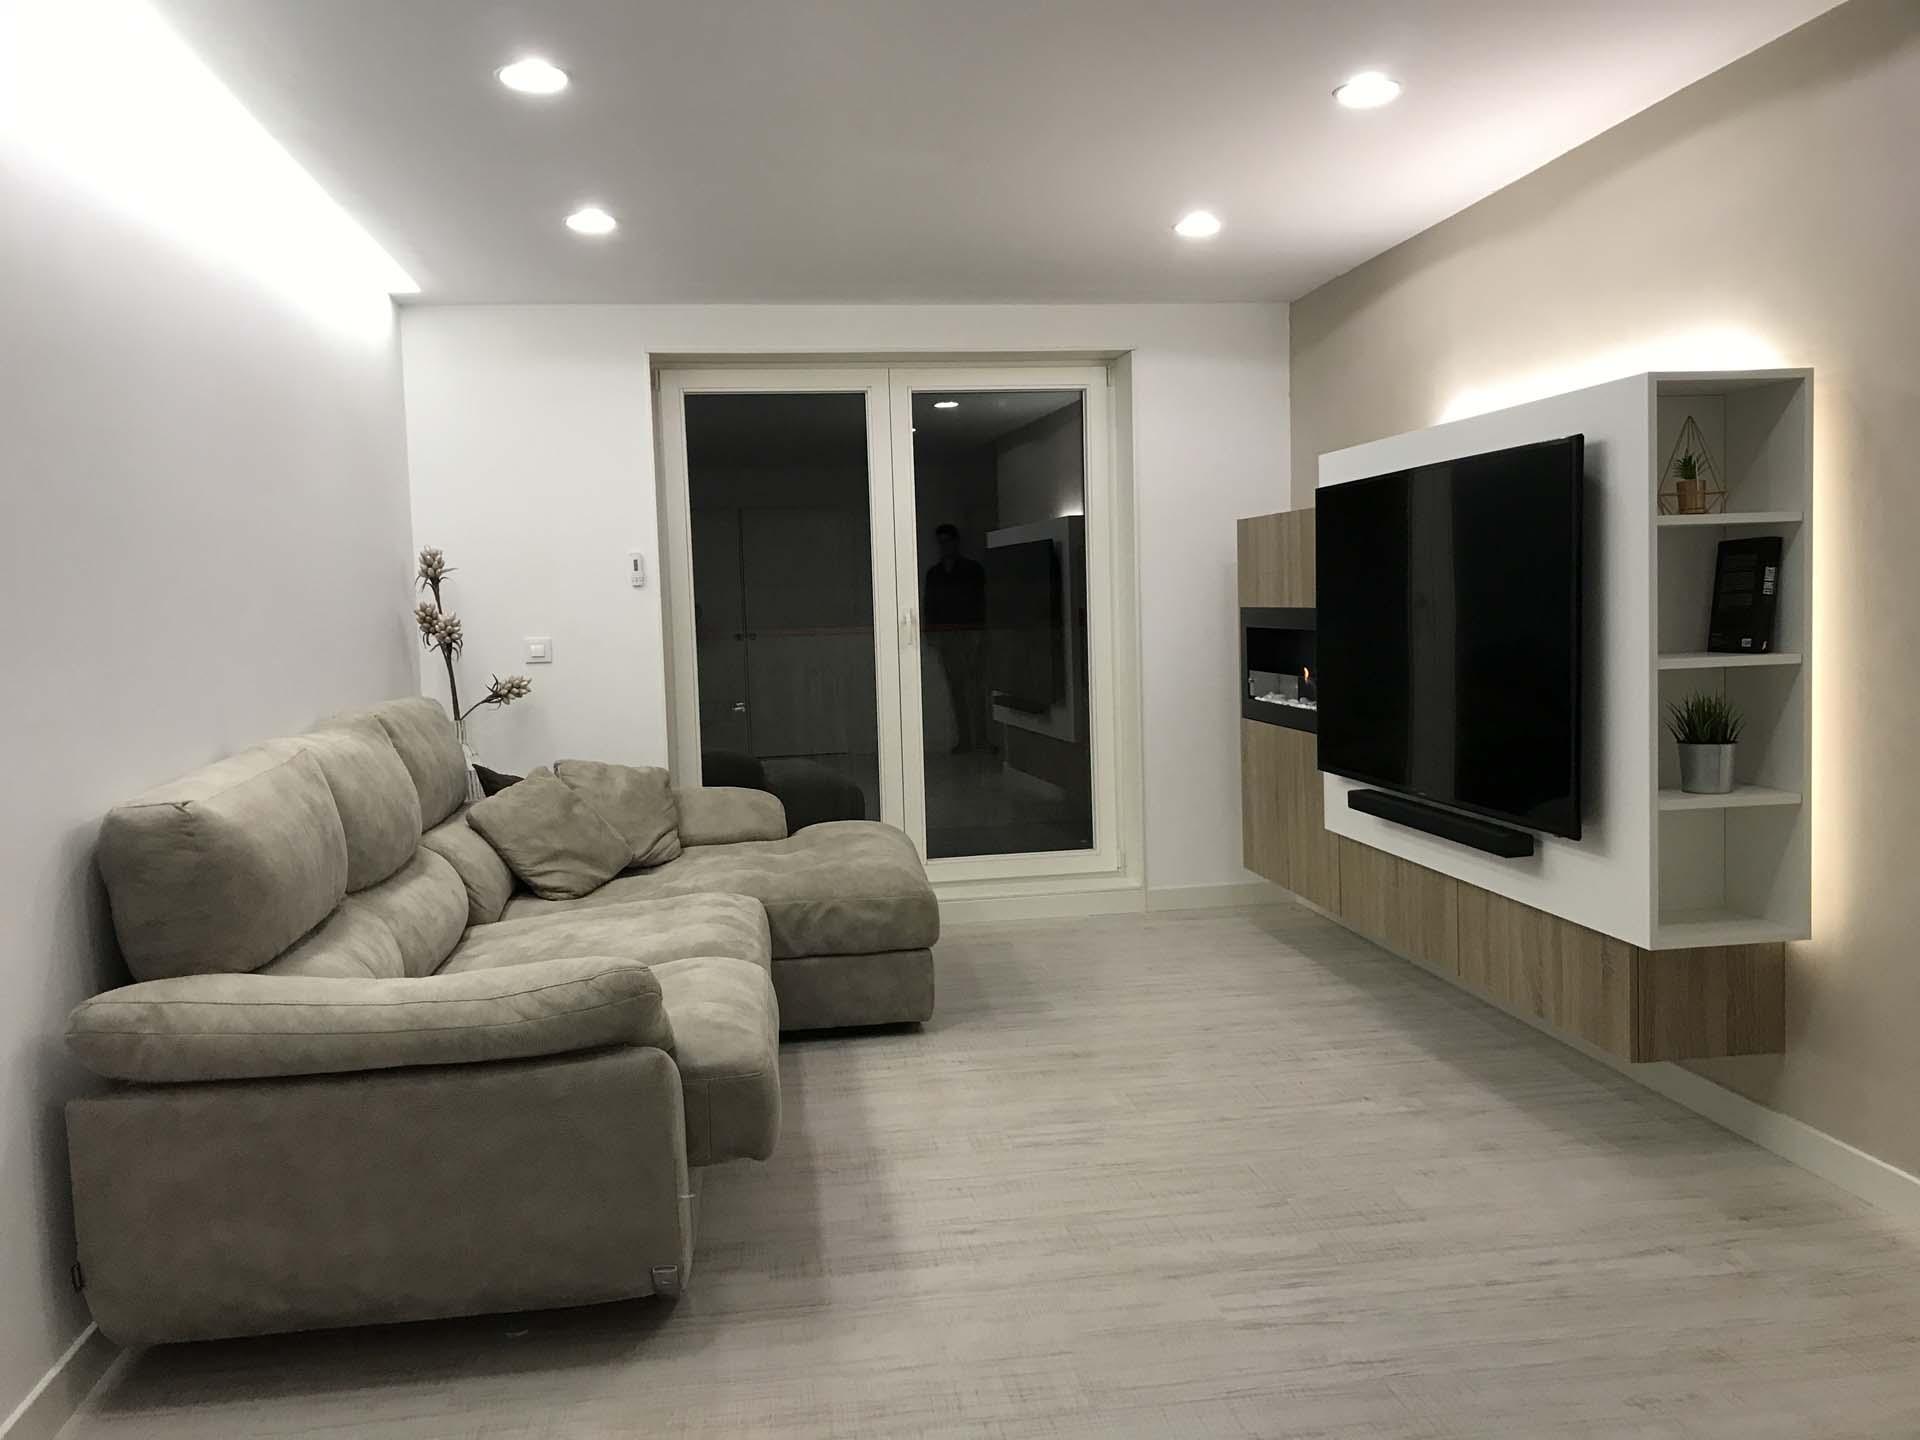 sal n con chimenea integrada arnit. Black Bedroom Furniture Sets. Home Design Ideas